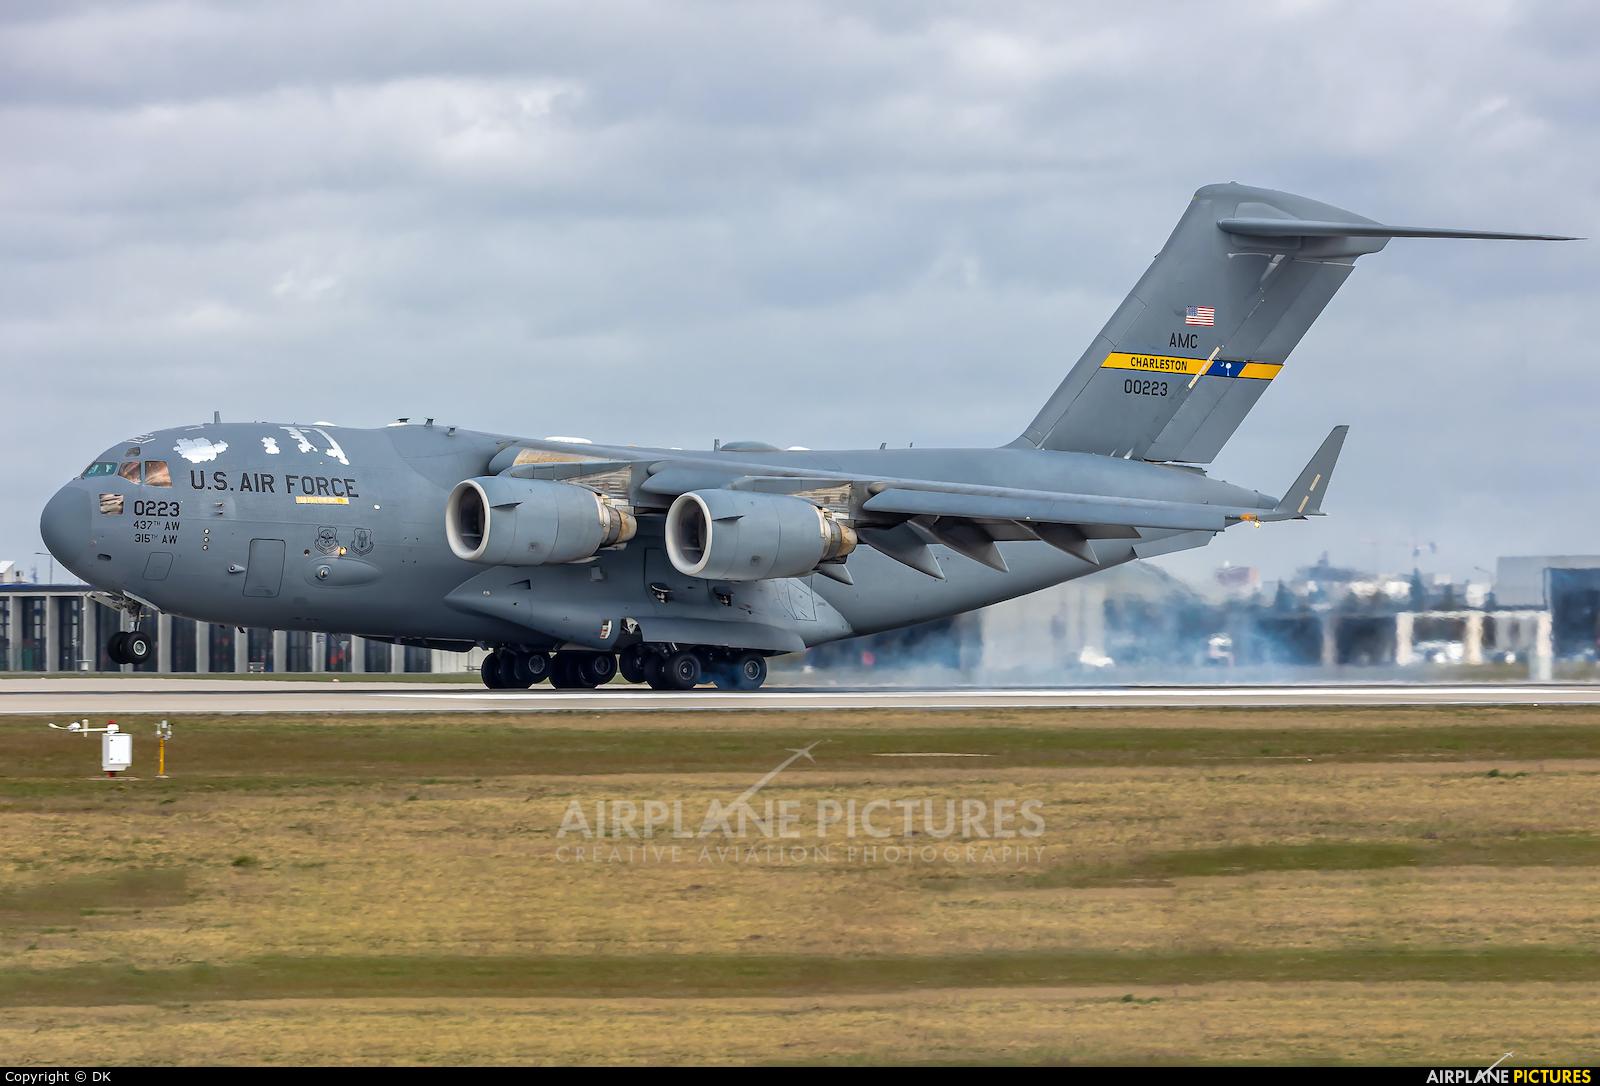 USA - Air Force 10-0223 aircraft at Berlin - Brandenburg